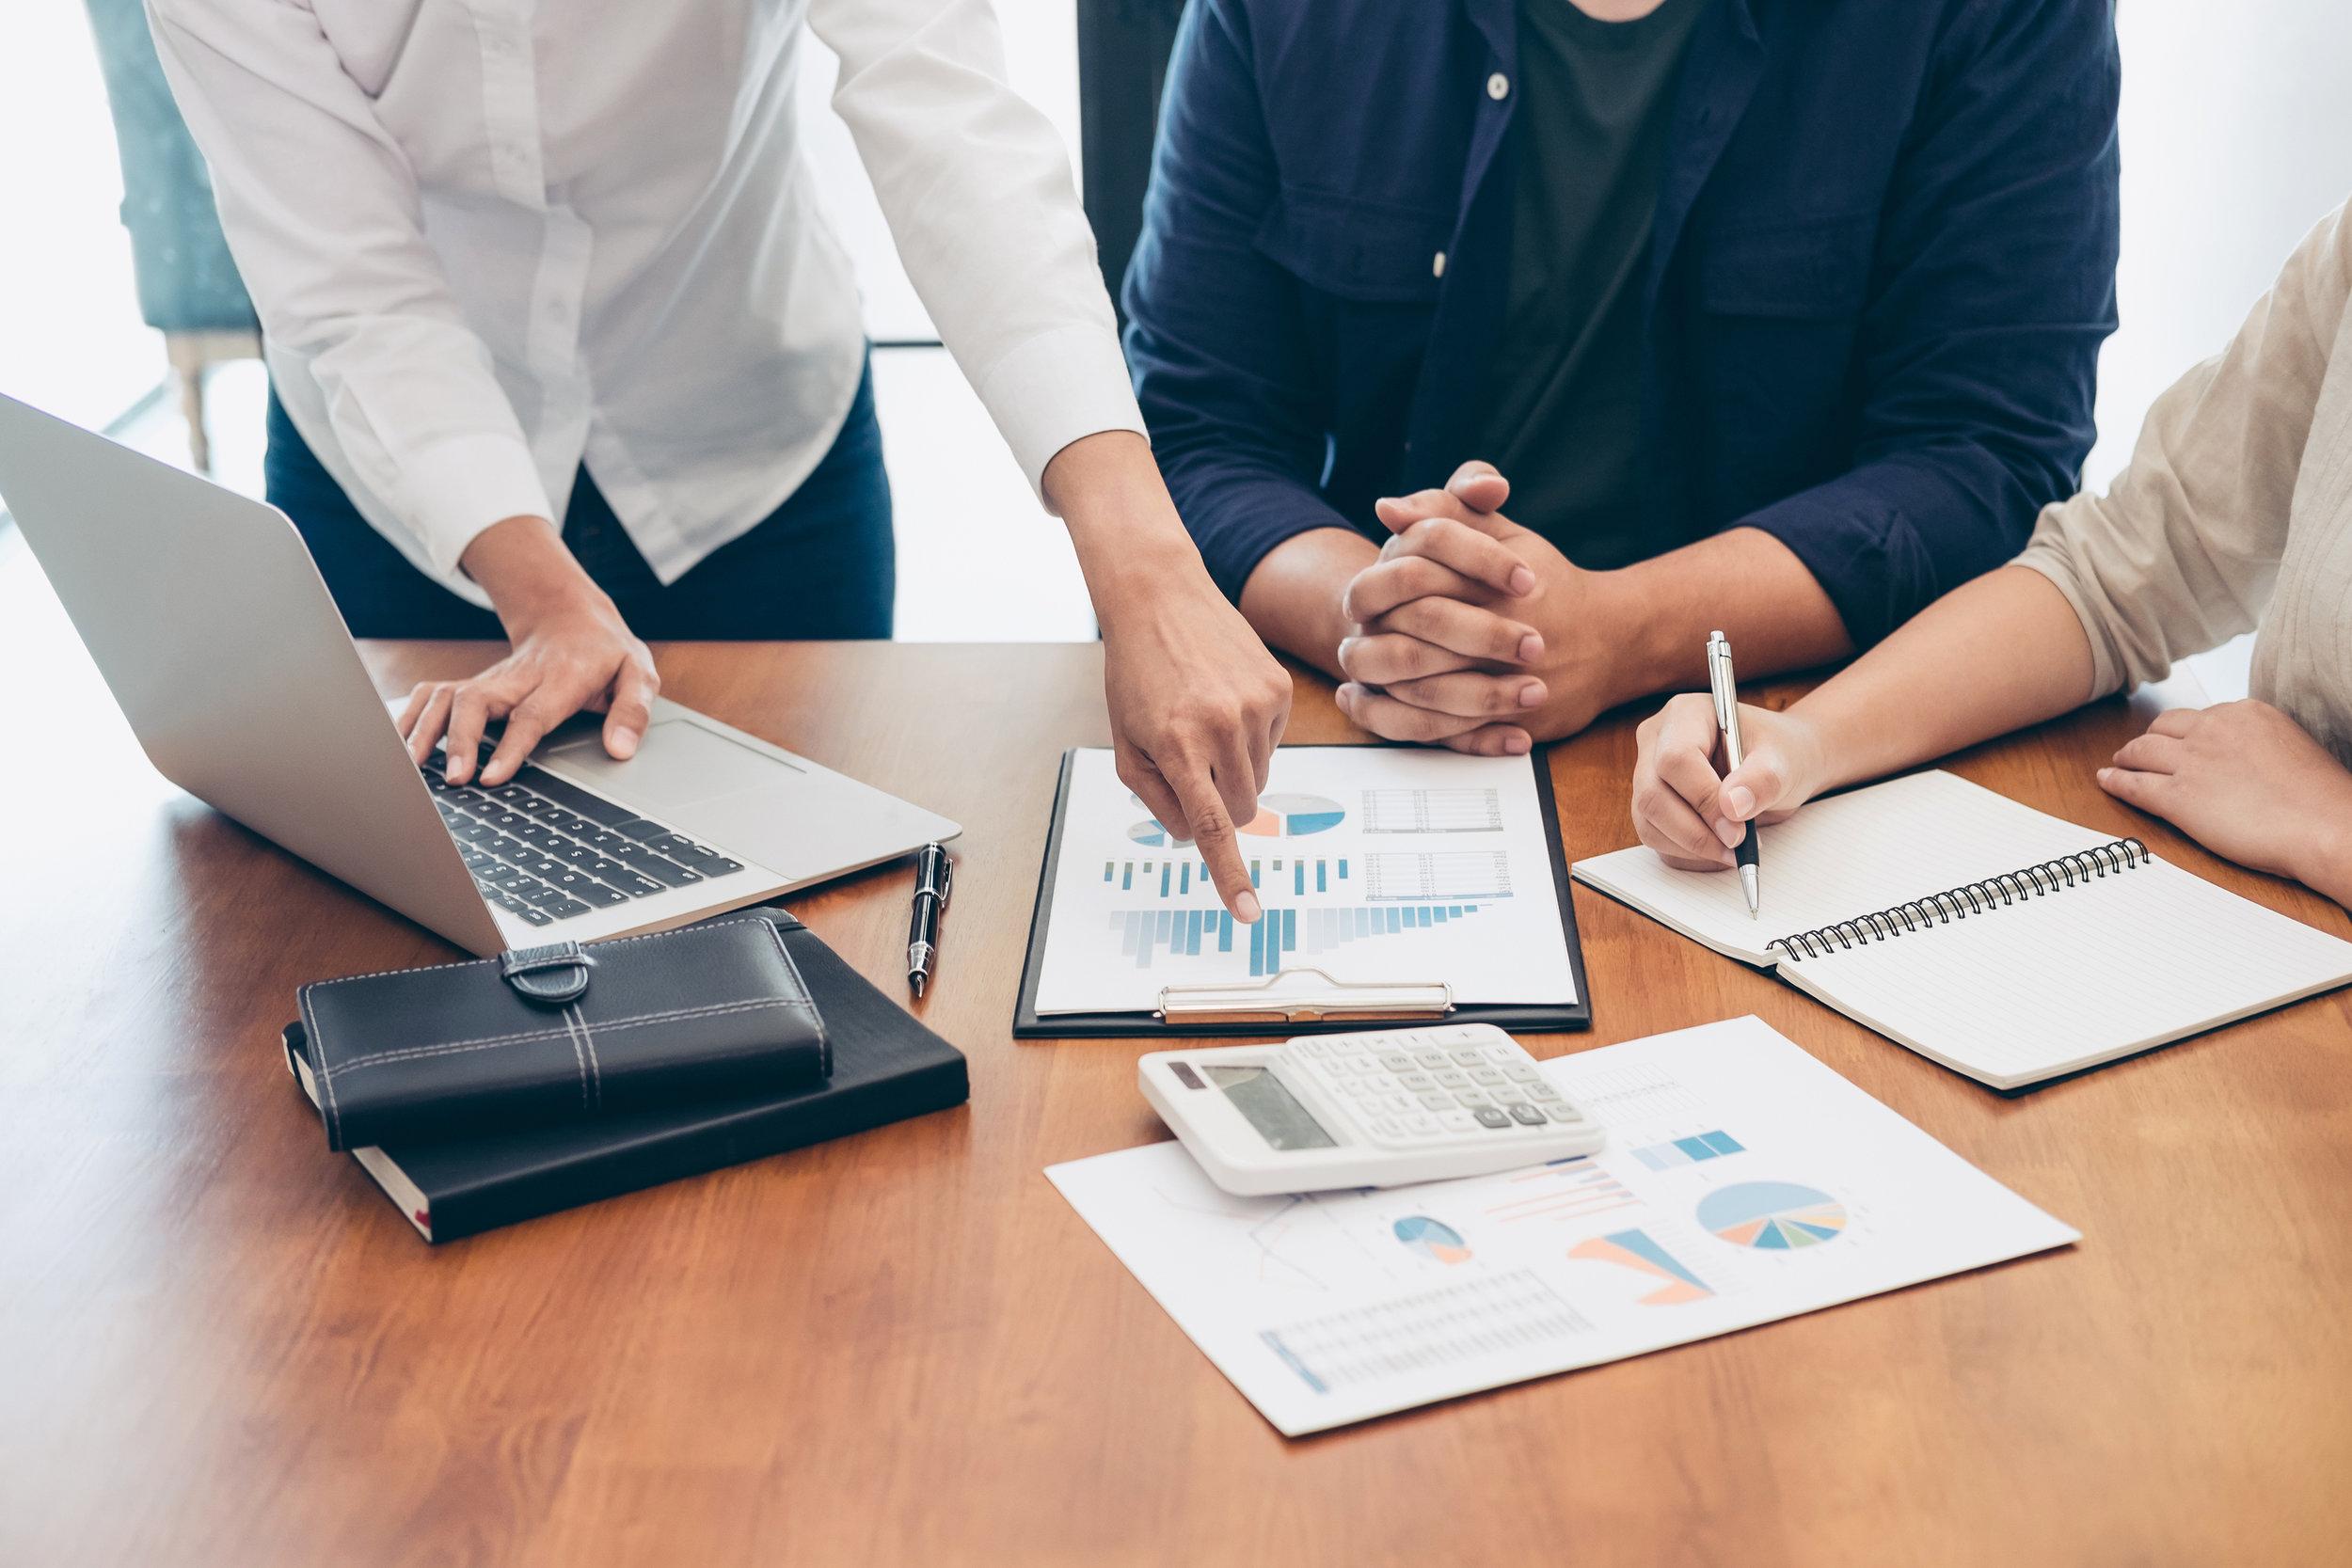 bigstock-Business-Team-Colleagues-Meeti-229265842.jpg